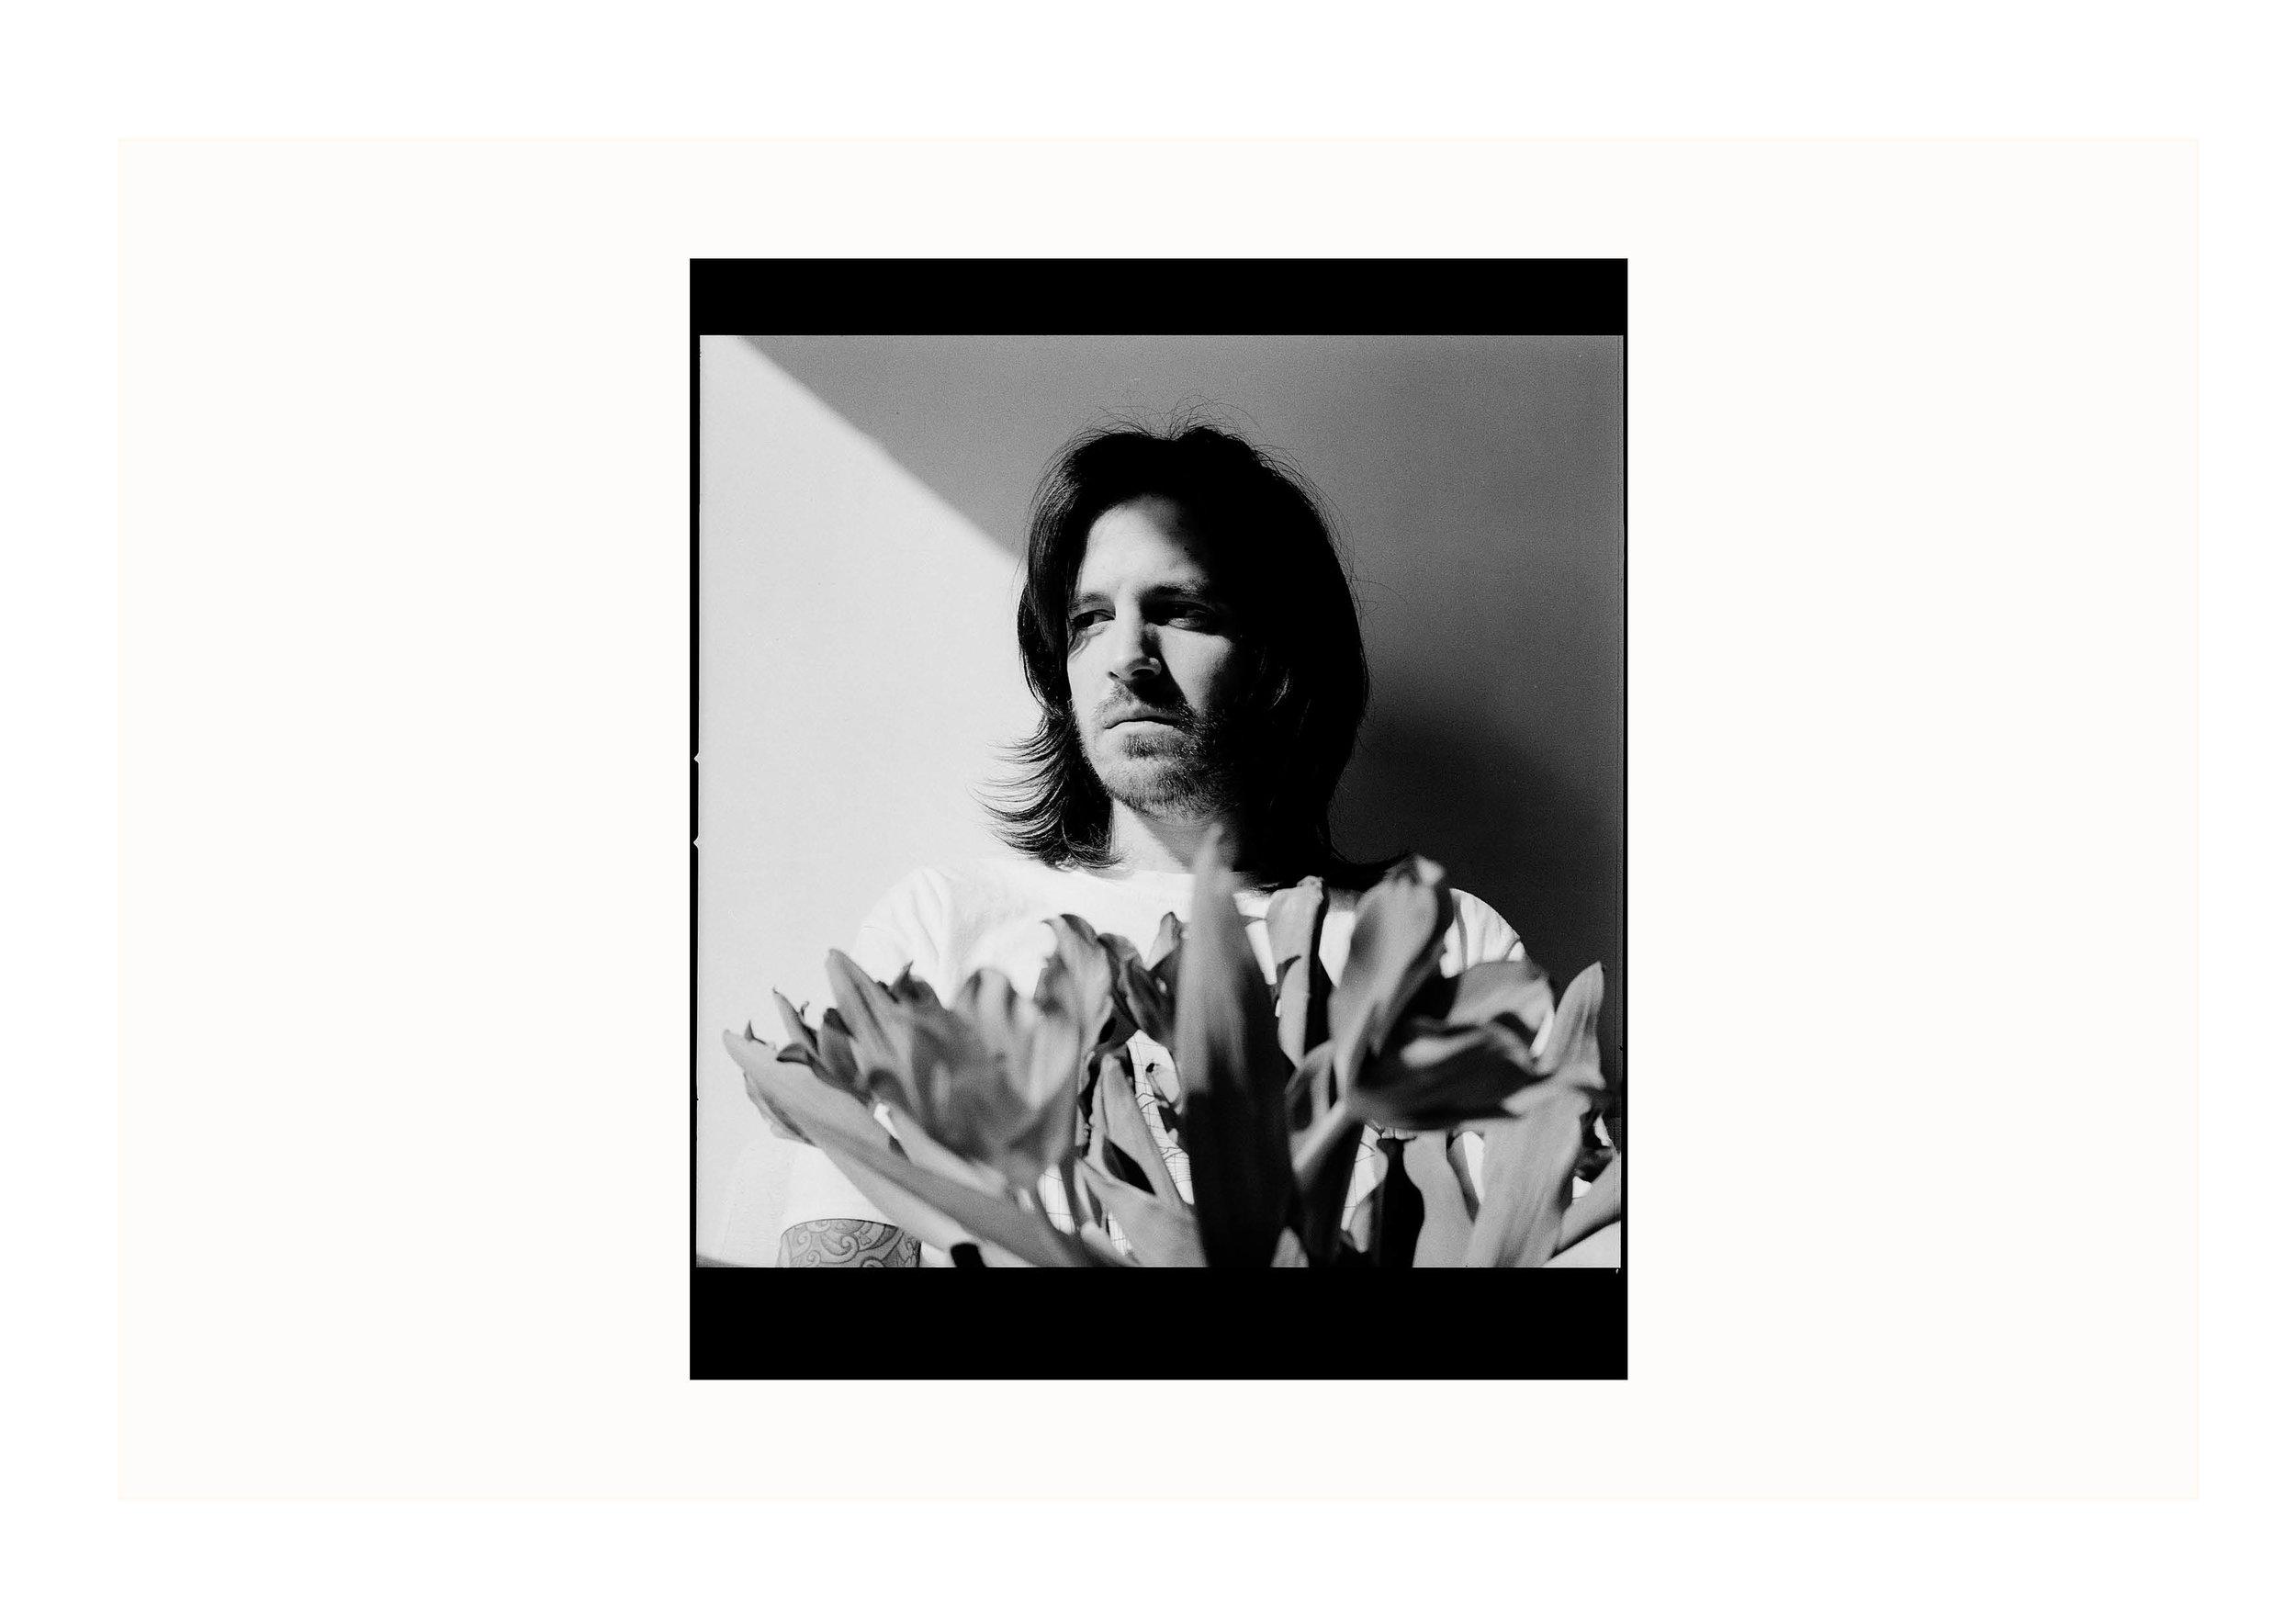 Rebecca Rose Harris, Portraits of Men